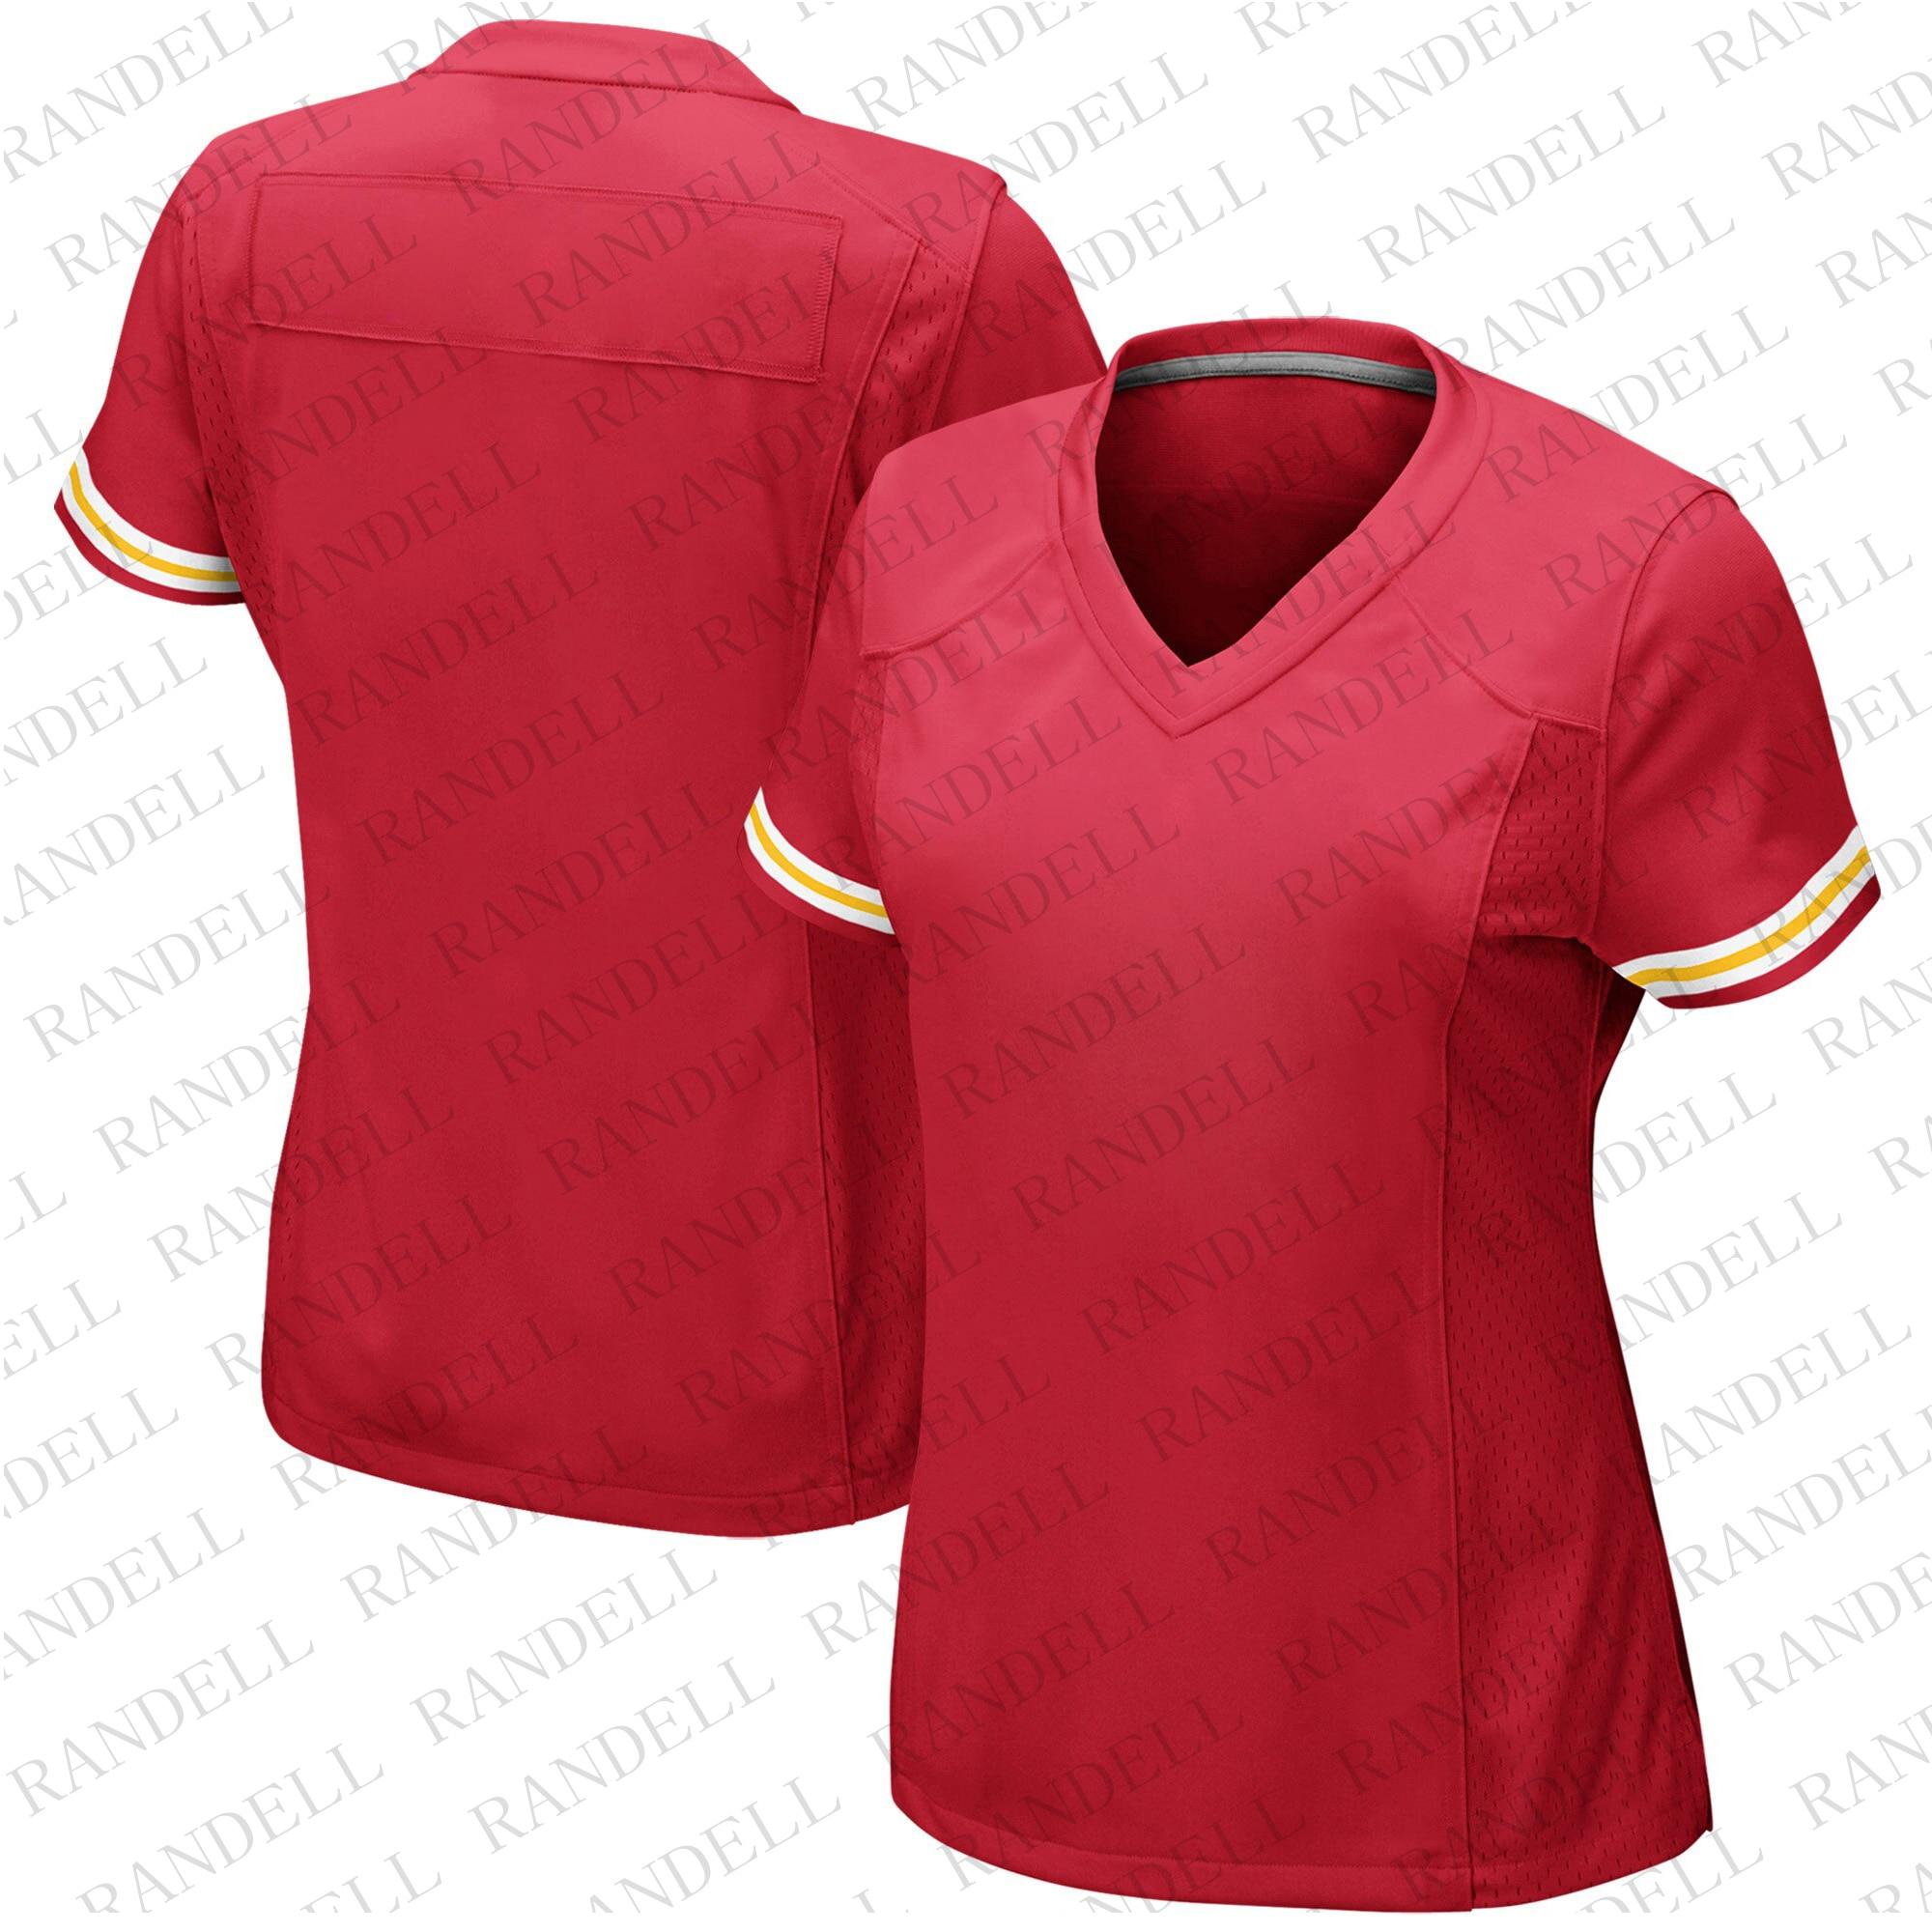 Camisetas de fútbol baratas para mujer, Camiseta deportiva para Fans de Kansas Patrick Mahomes Travis Kelce Joe Montana Berry Smith Mathieu, jerséis rojos